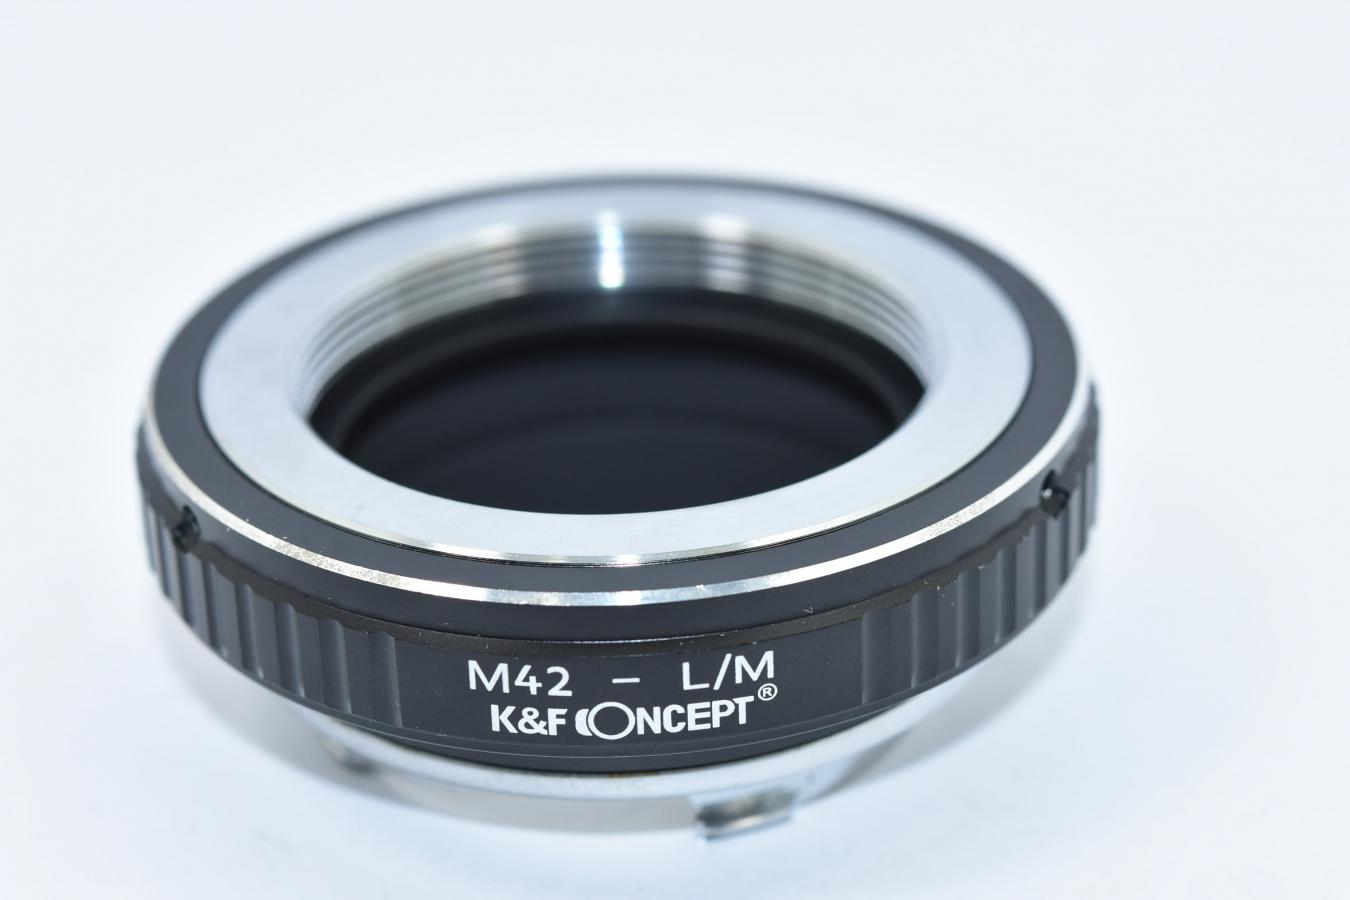 K&F CONCEPT KF-42M 【M42マウント→ライカMマウント変換】